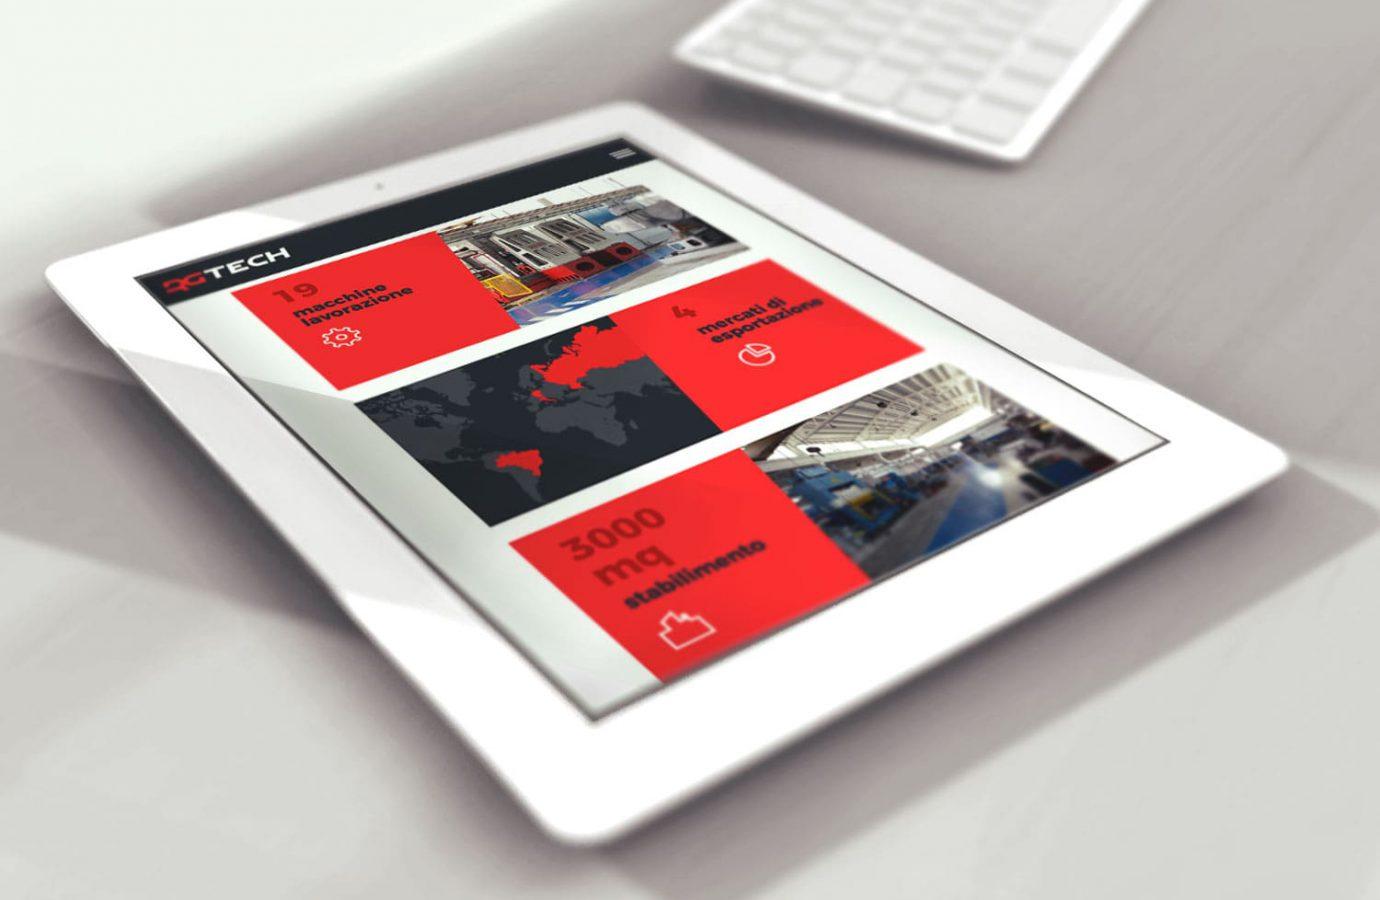 WillBe - web design Rgtech tablet